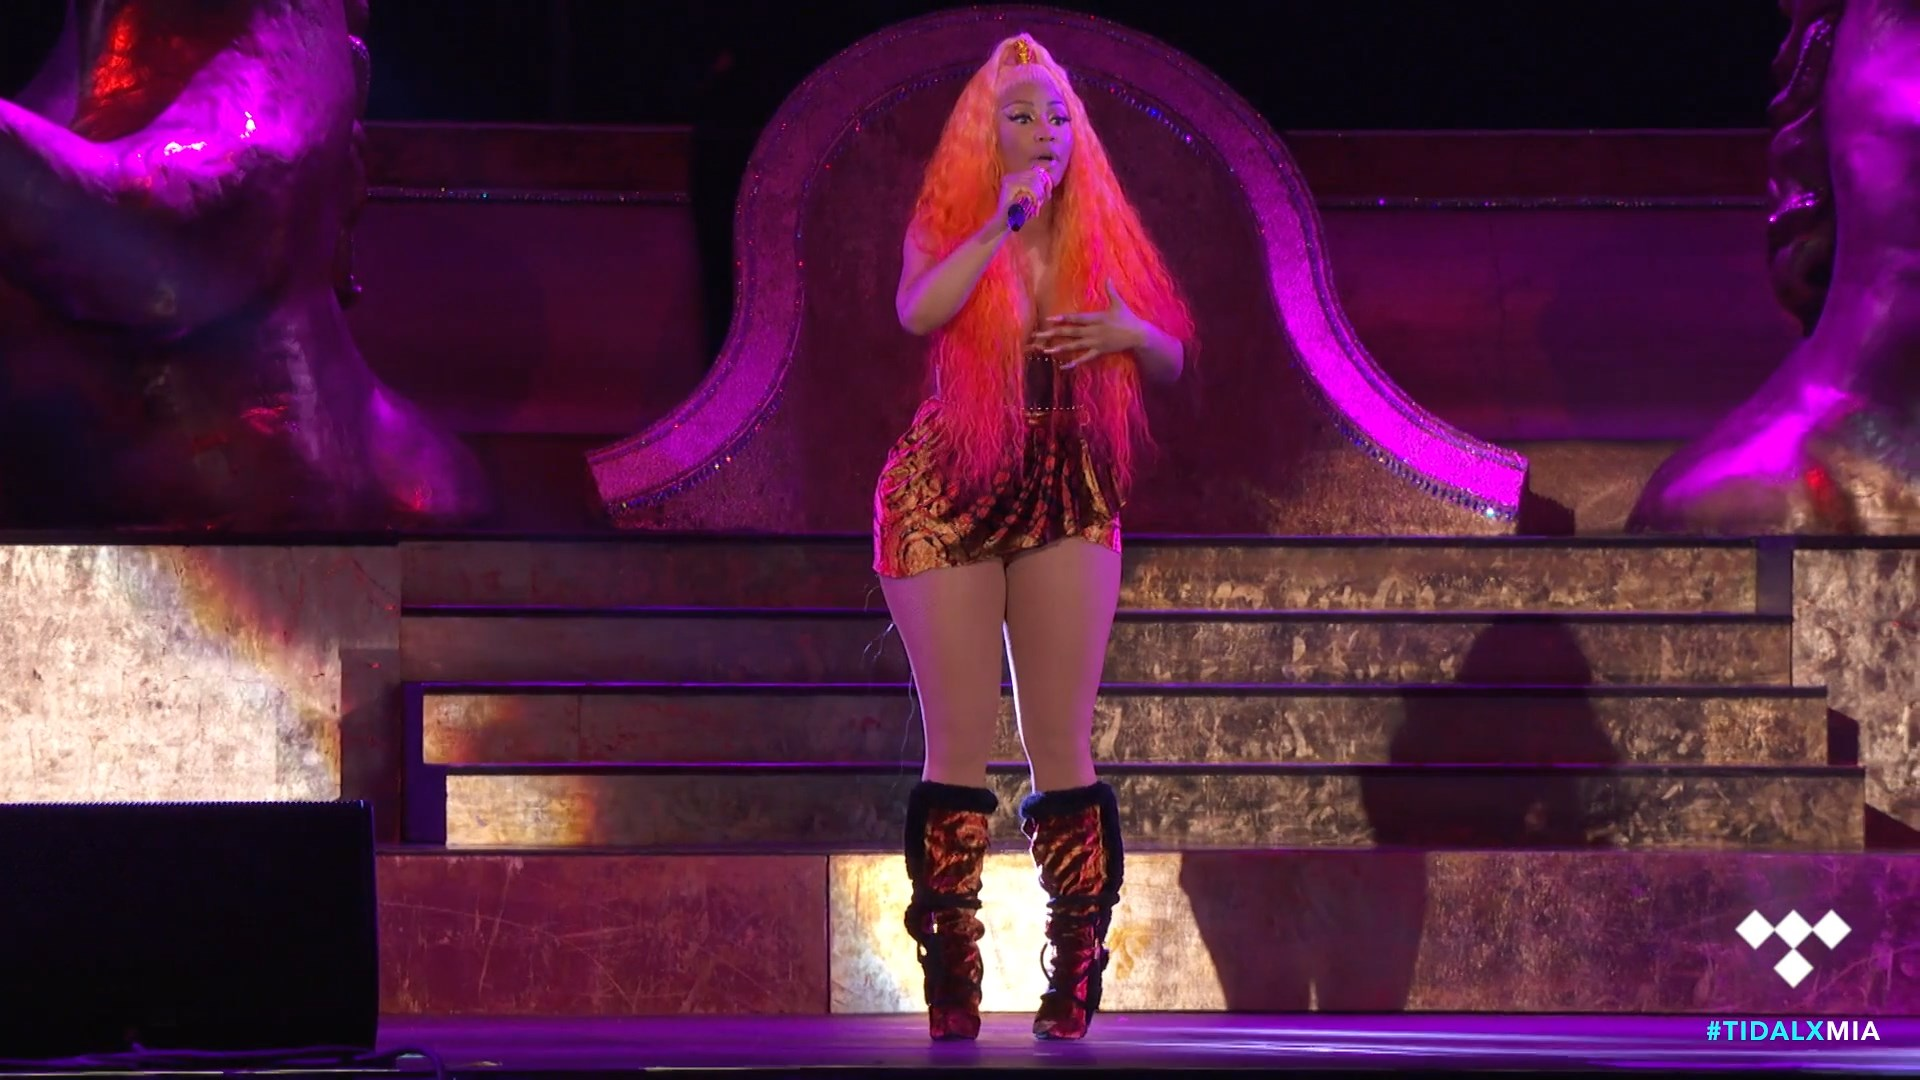 Nicki-Minaj-Nude-TheFappeningBlog.com-12.jpg